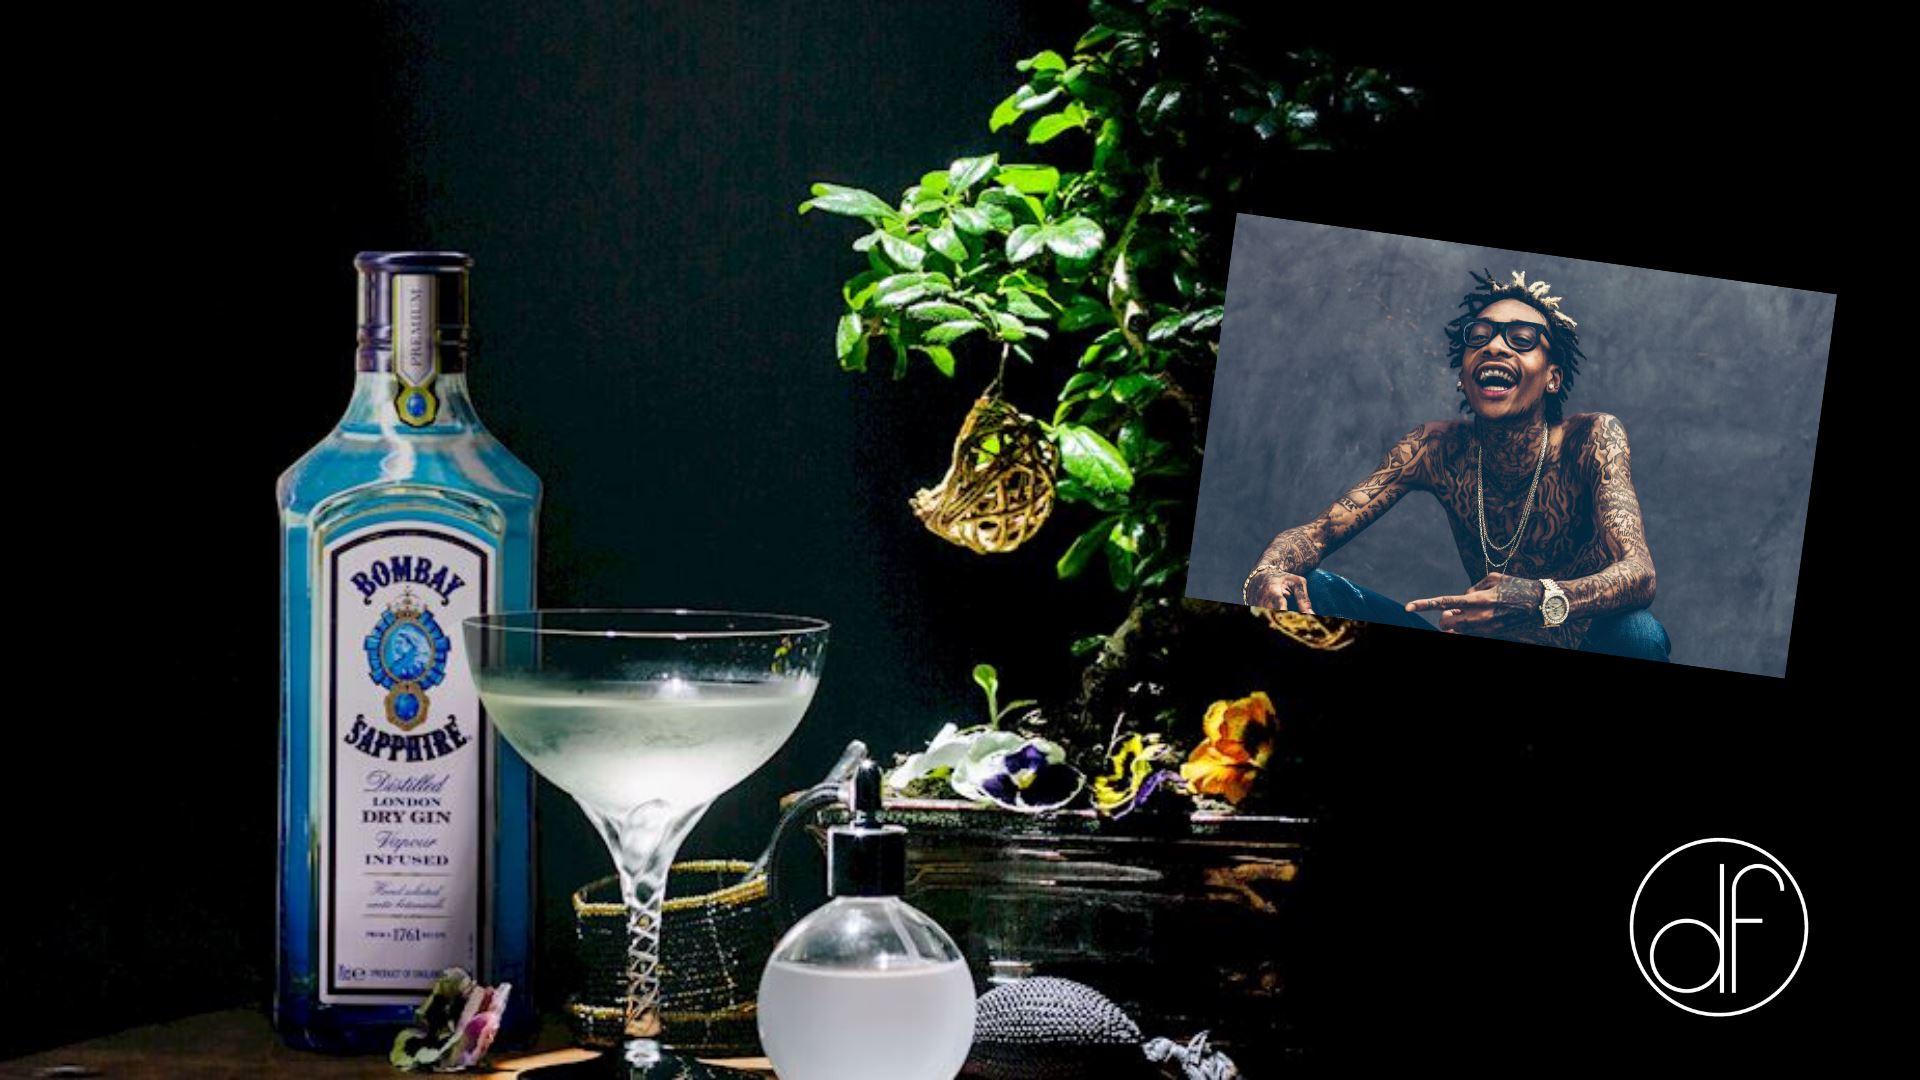 Wiz Khalifa & Bombay Gin